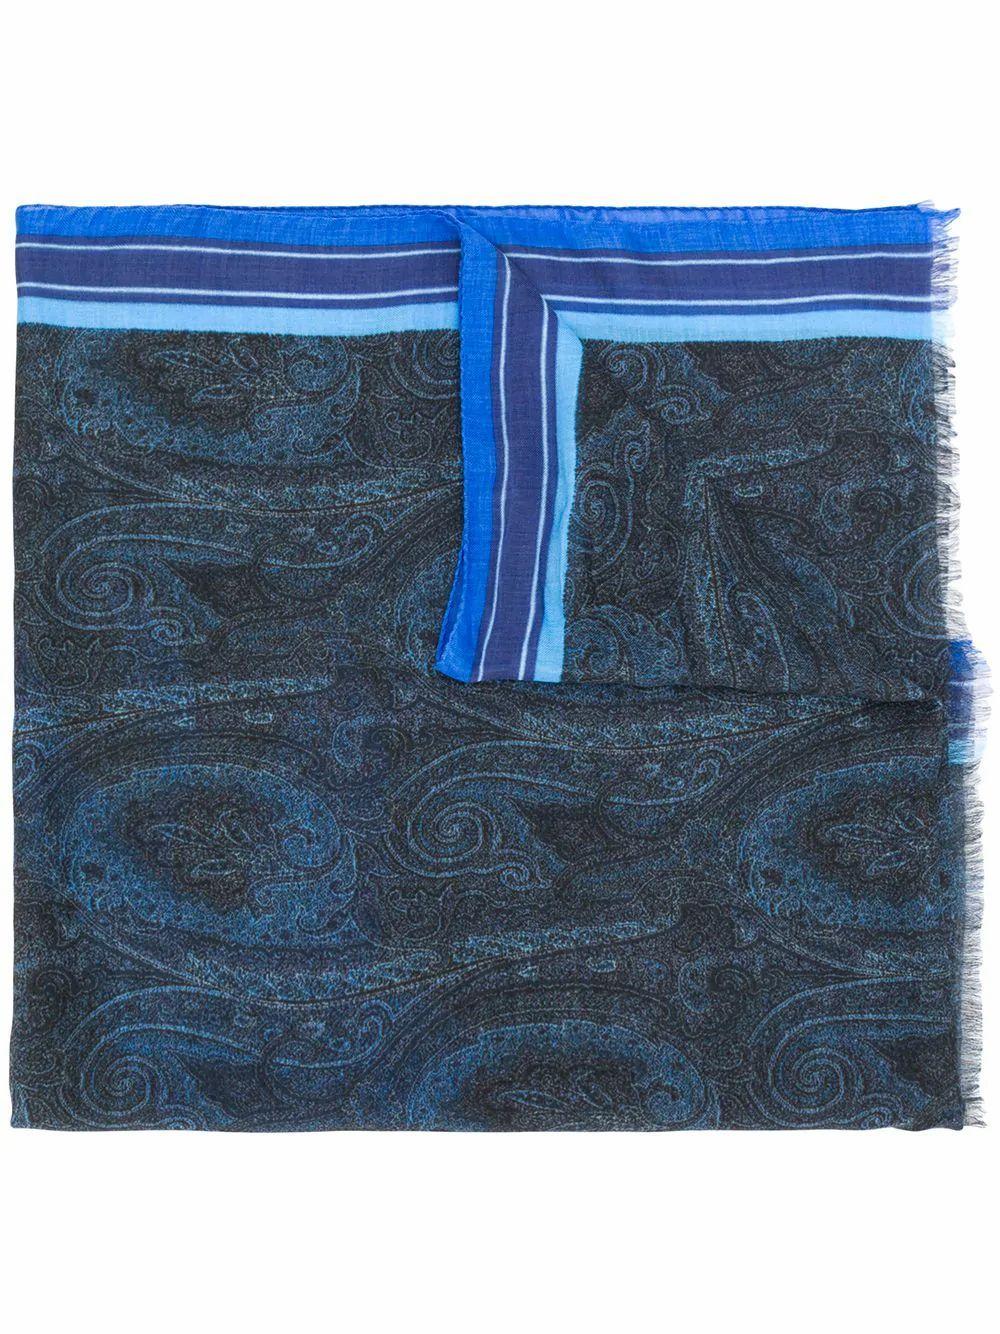 ETRO MEN'S 1000750200200 BLUE MODAL SCARF